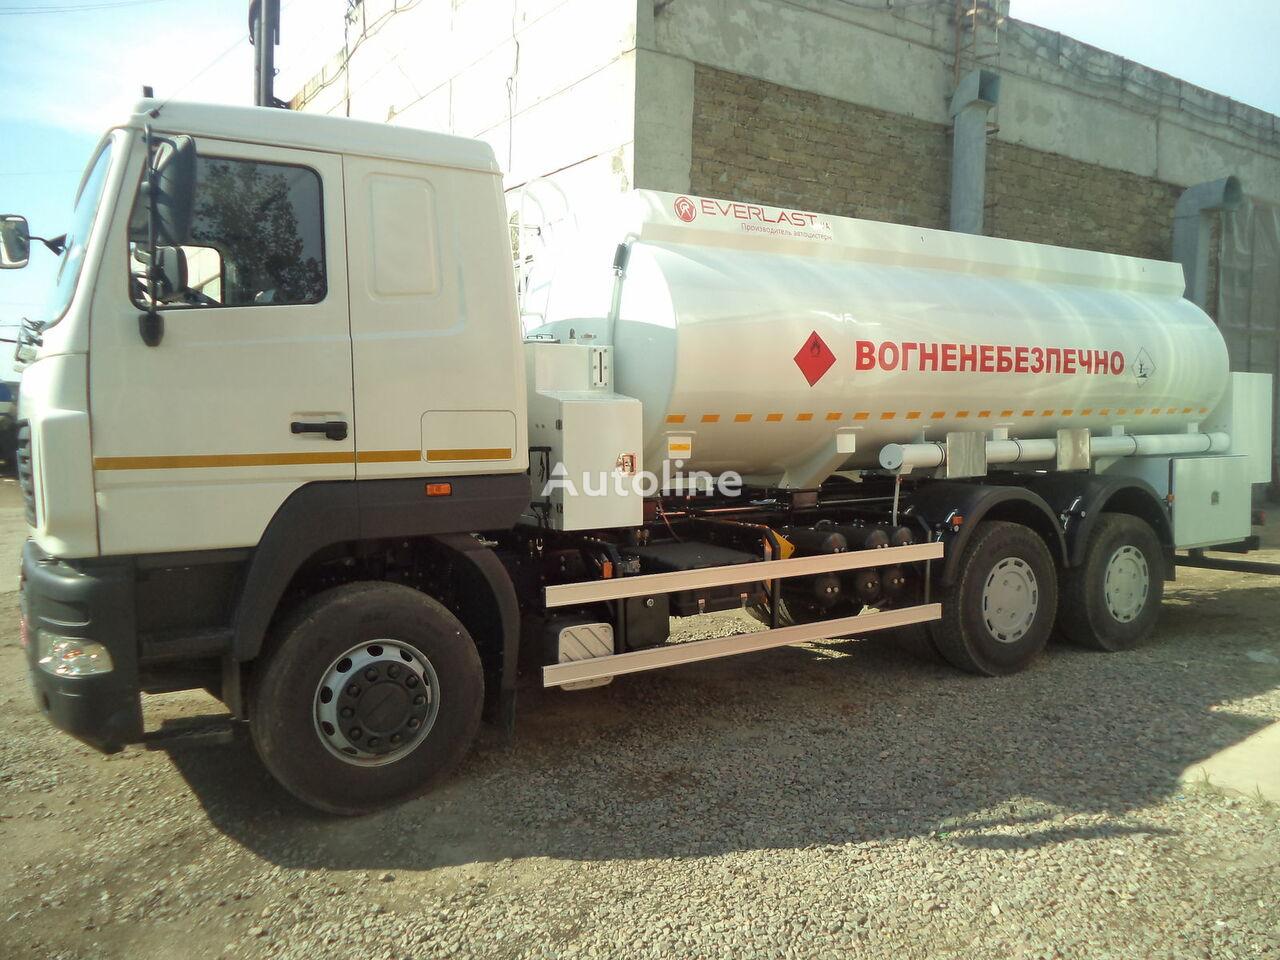 xe tải nhiên liệu MAZ Everlast mới